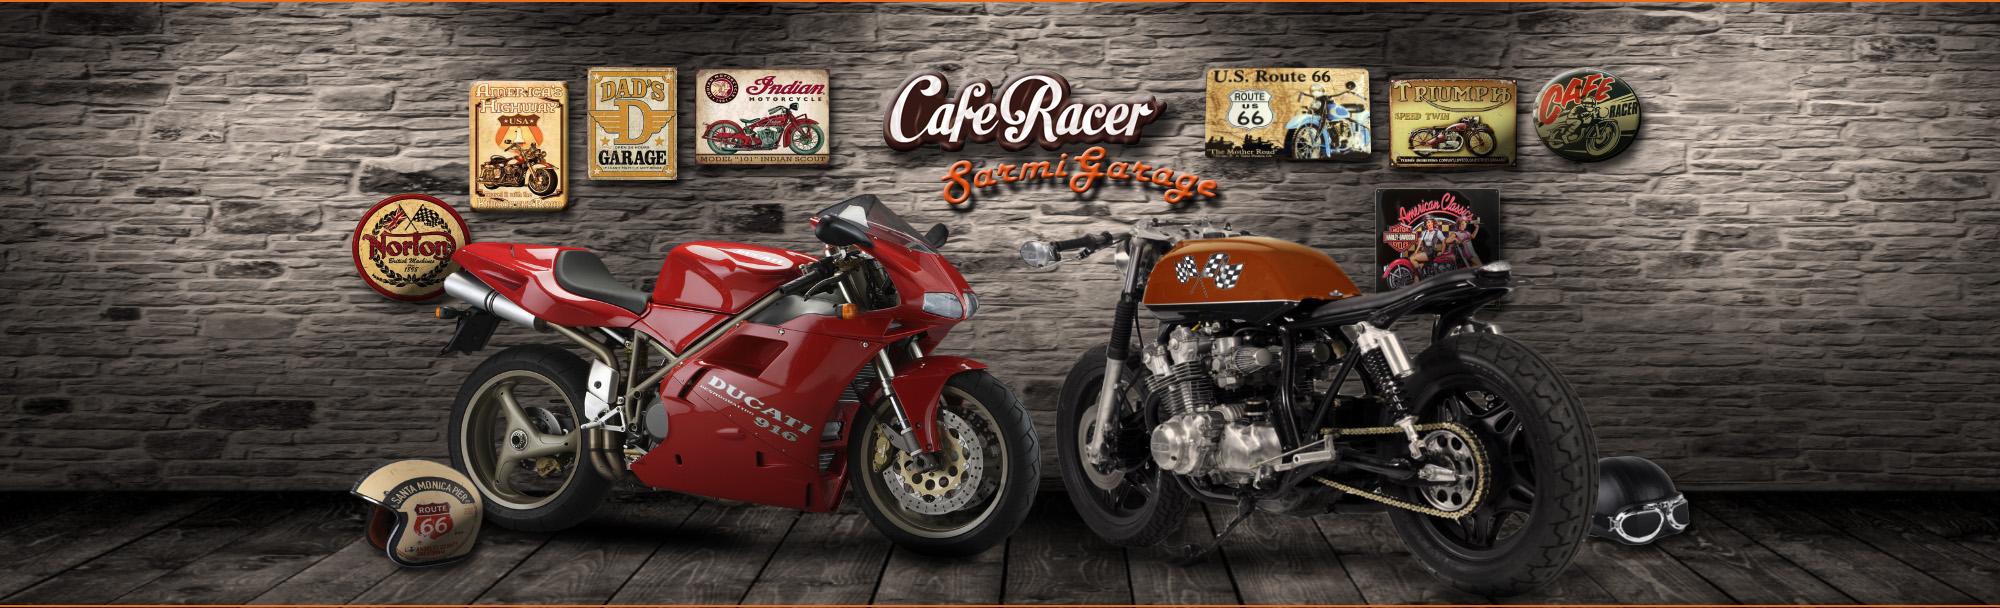 venta motos barcelona, taller venta motocicletas hospitalet baix llobregat